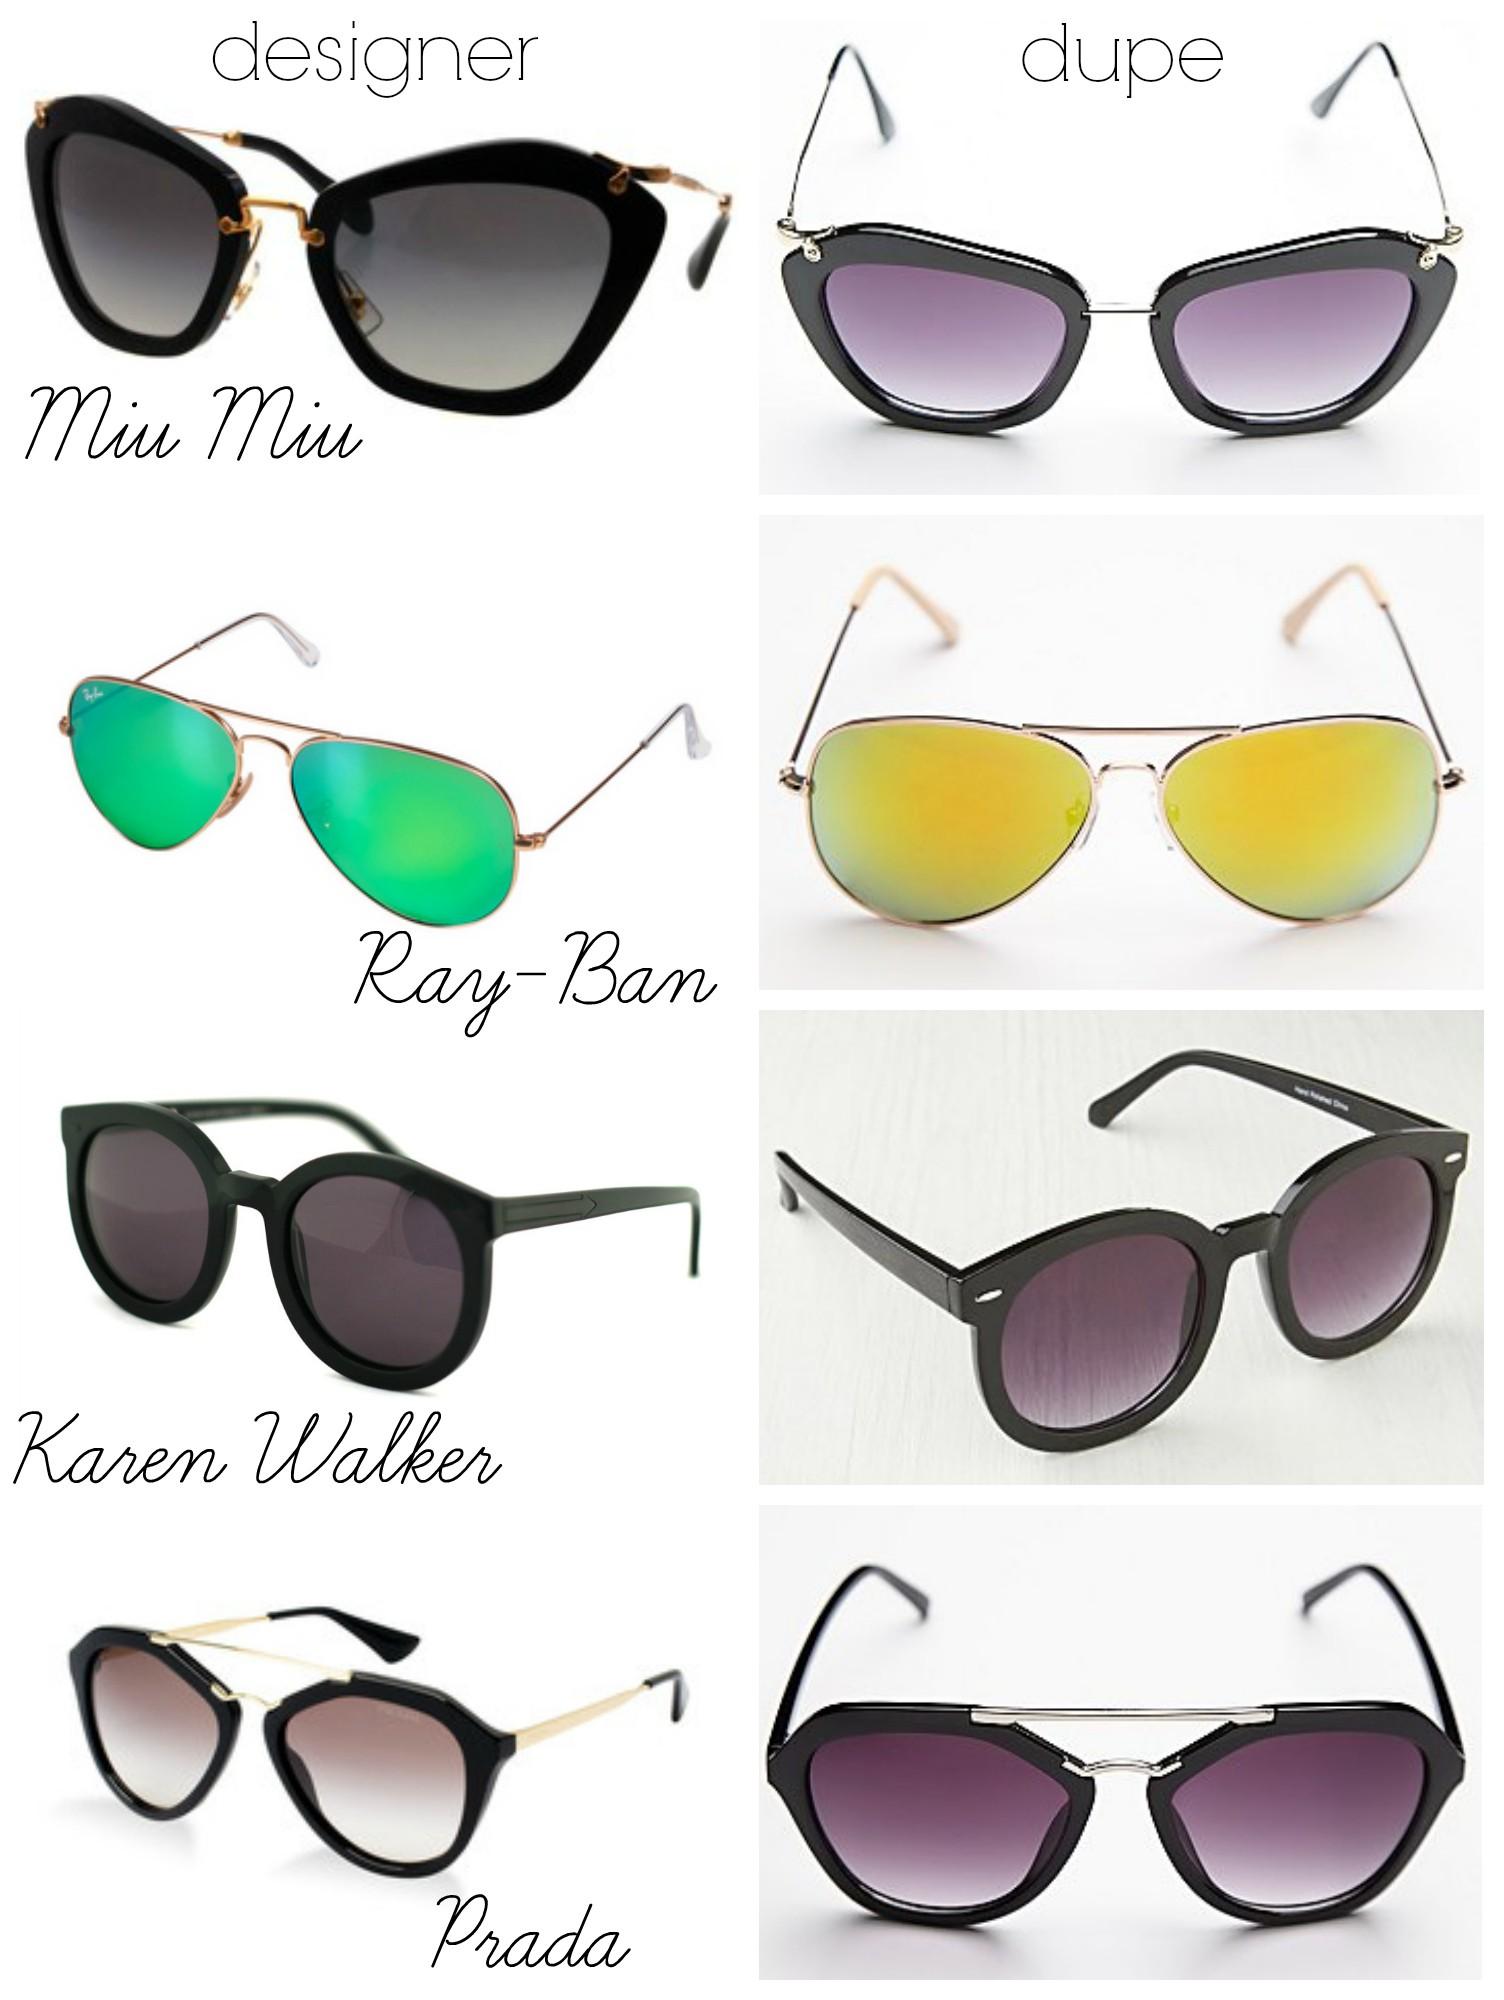 prada handbag bag - Belle de Couture: The Look For Less: Dupes For Designer Sunglasses